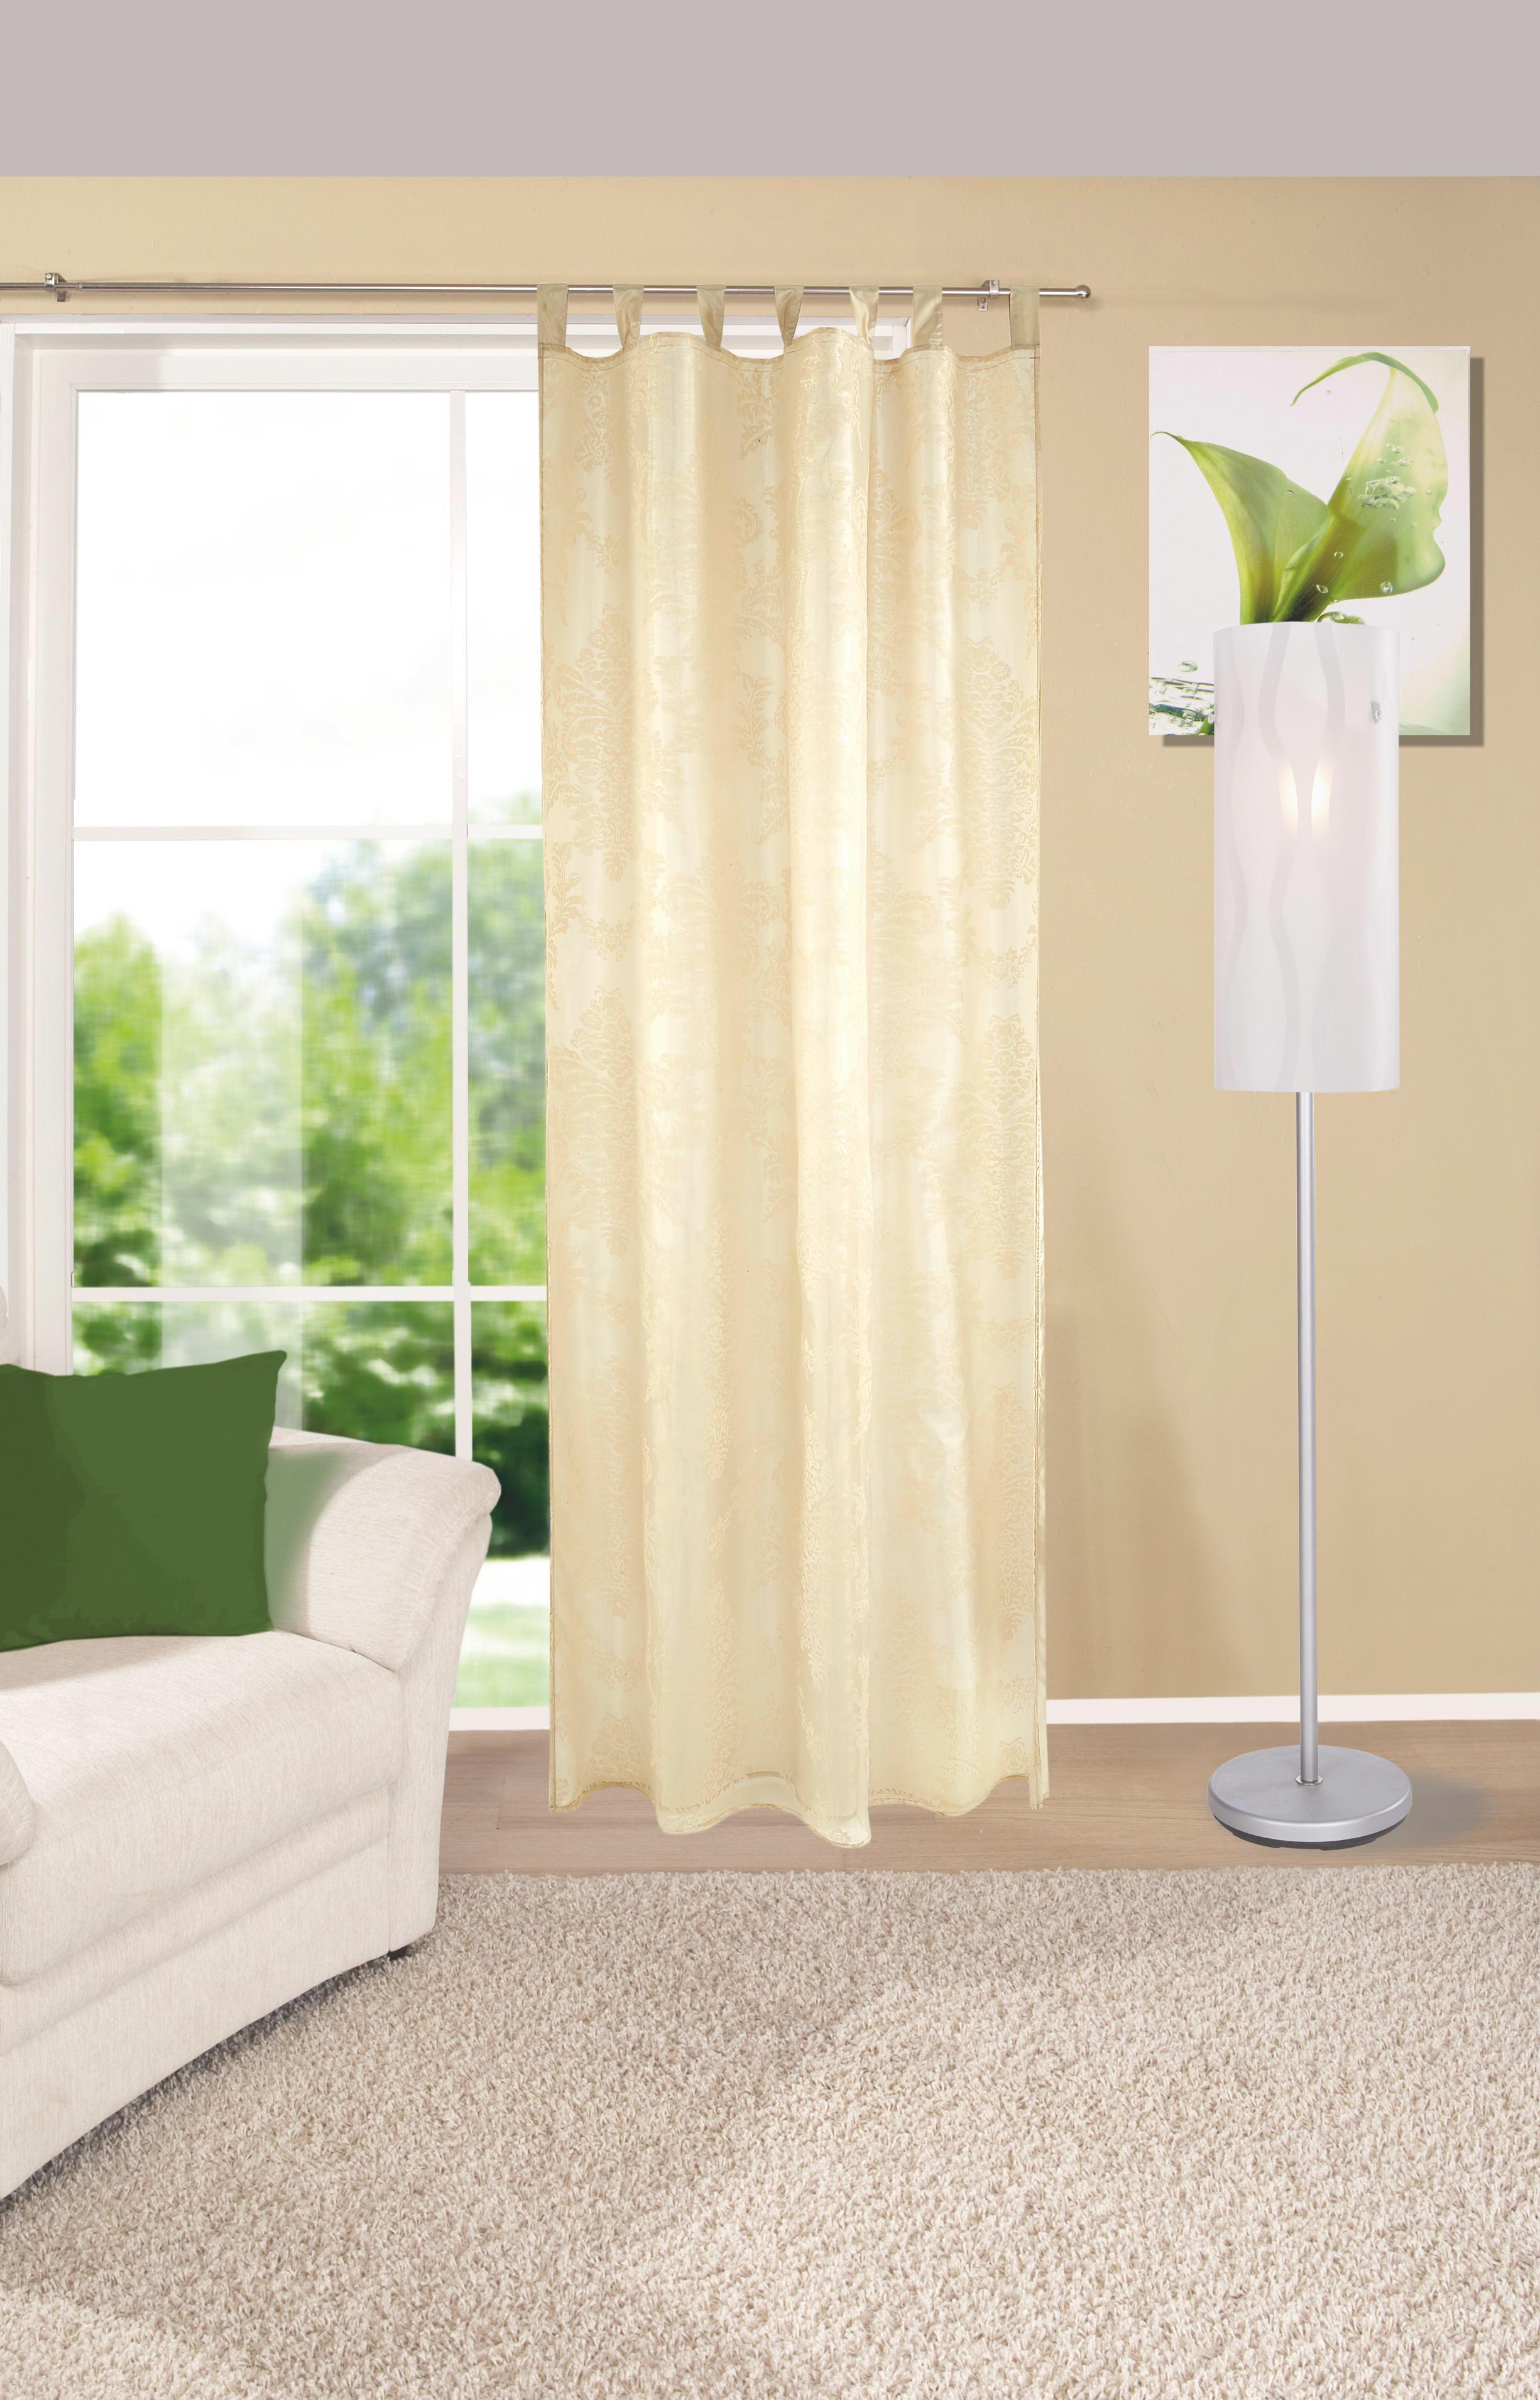 vorhnge fr schienen elegant ikea wie z b hugad weiss with vorhnge fr schienen good weiss with. Black Bedroom Furniture Sets. Home Design Ideas